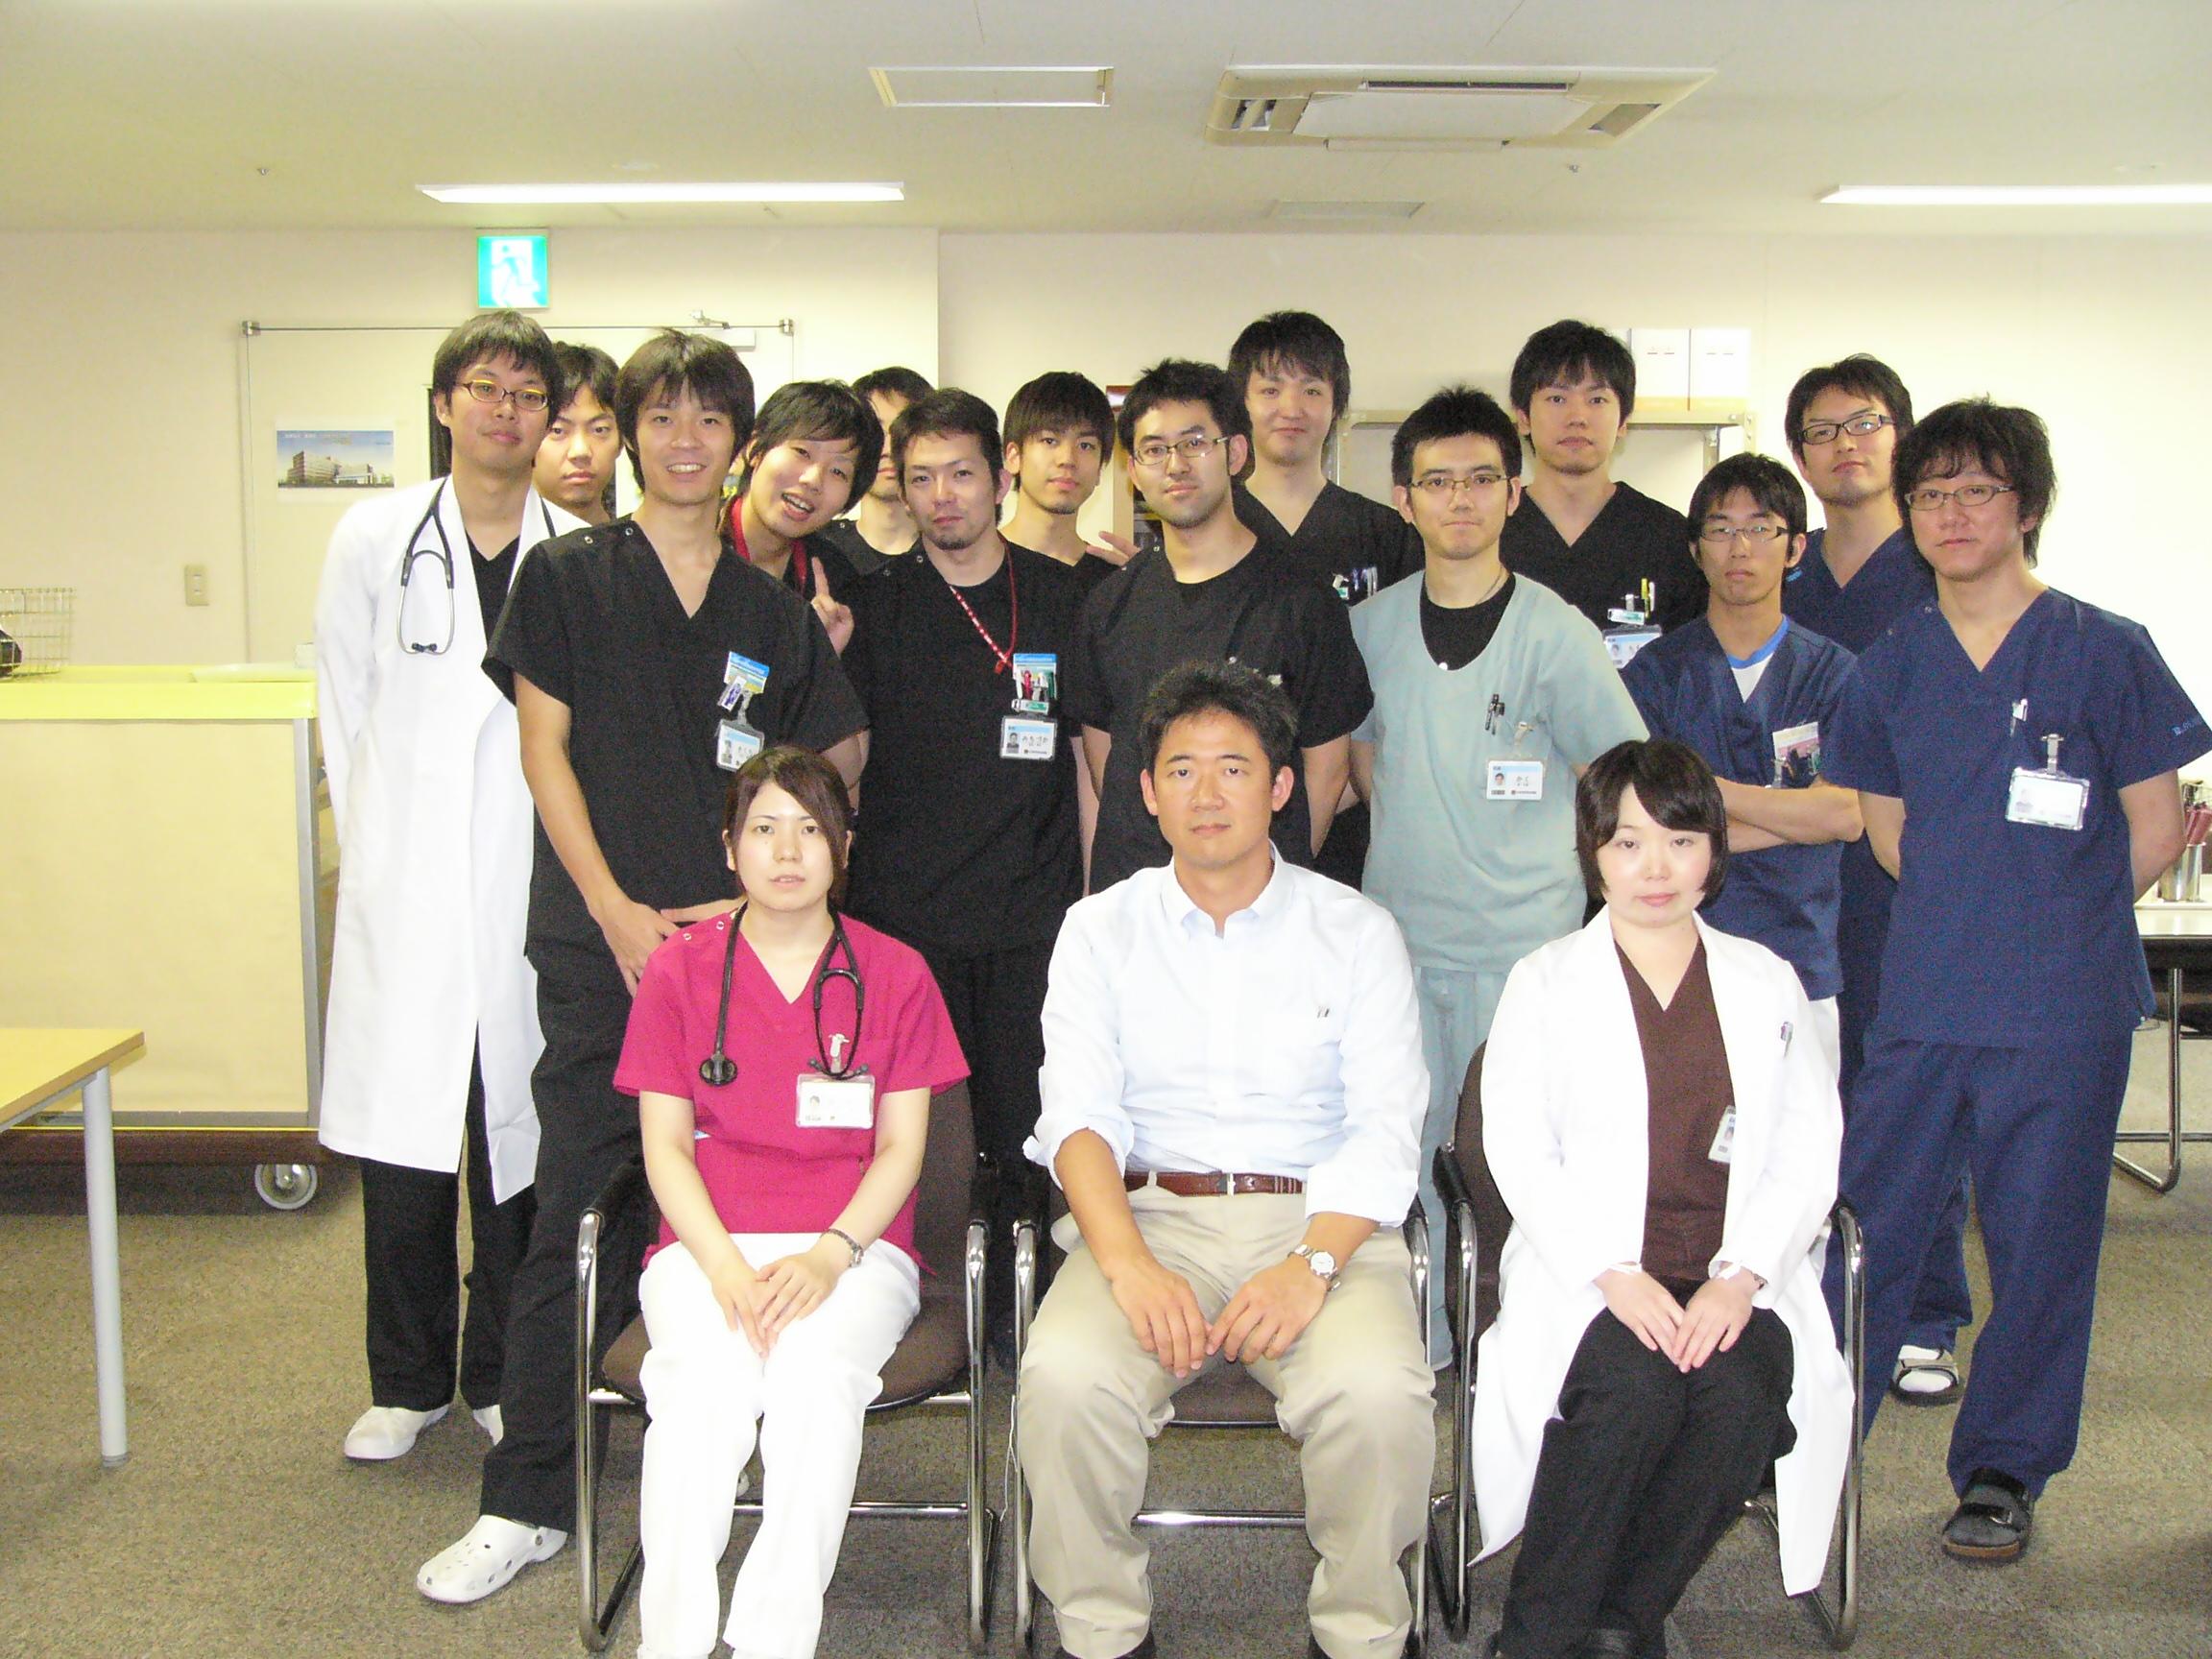 http://blog.higashi-tokushukai.or.jp/ydblog/P1130058.JPG